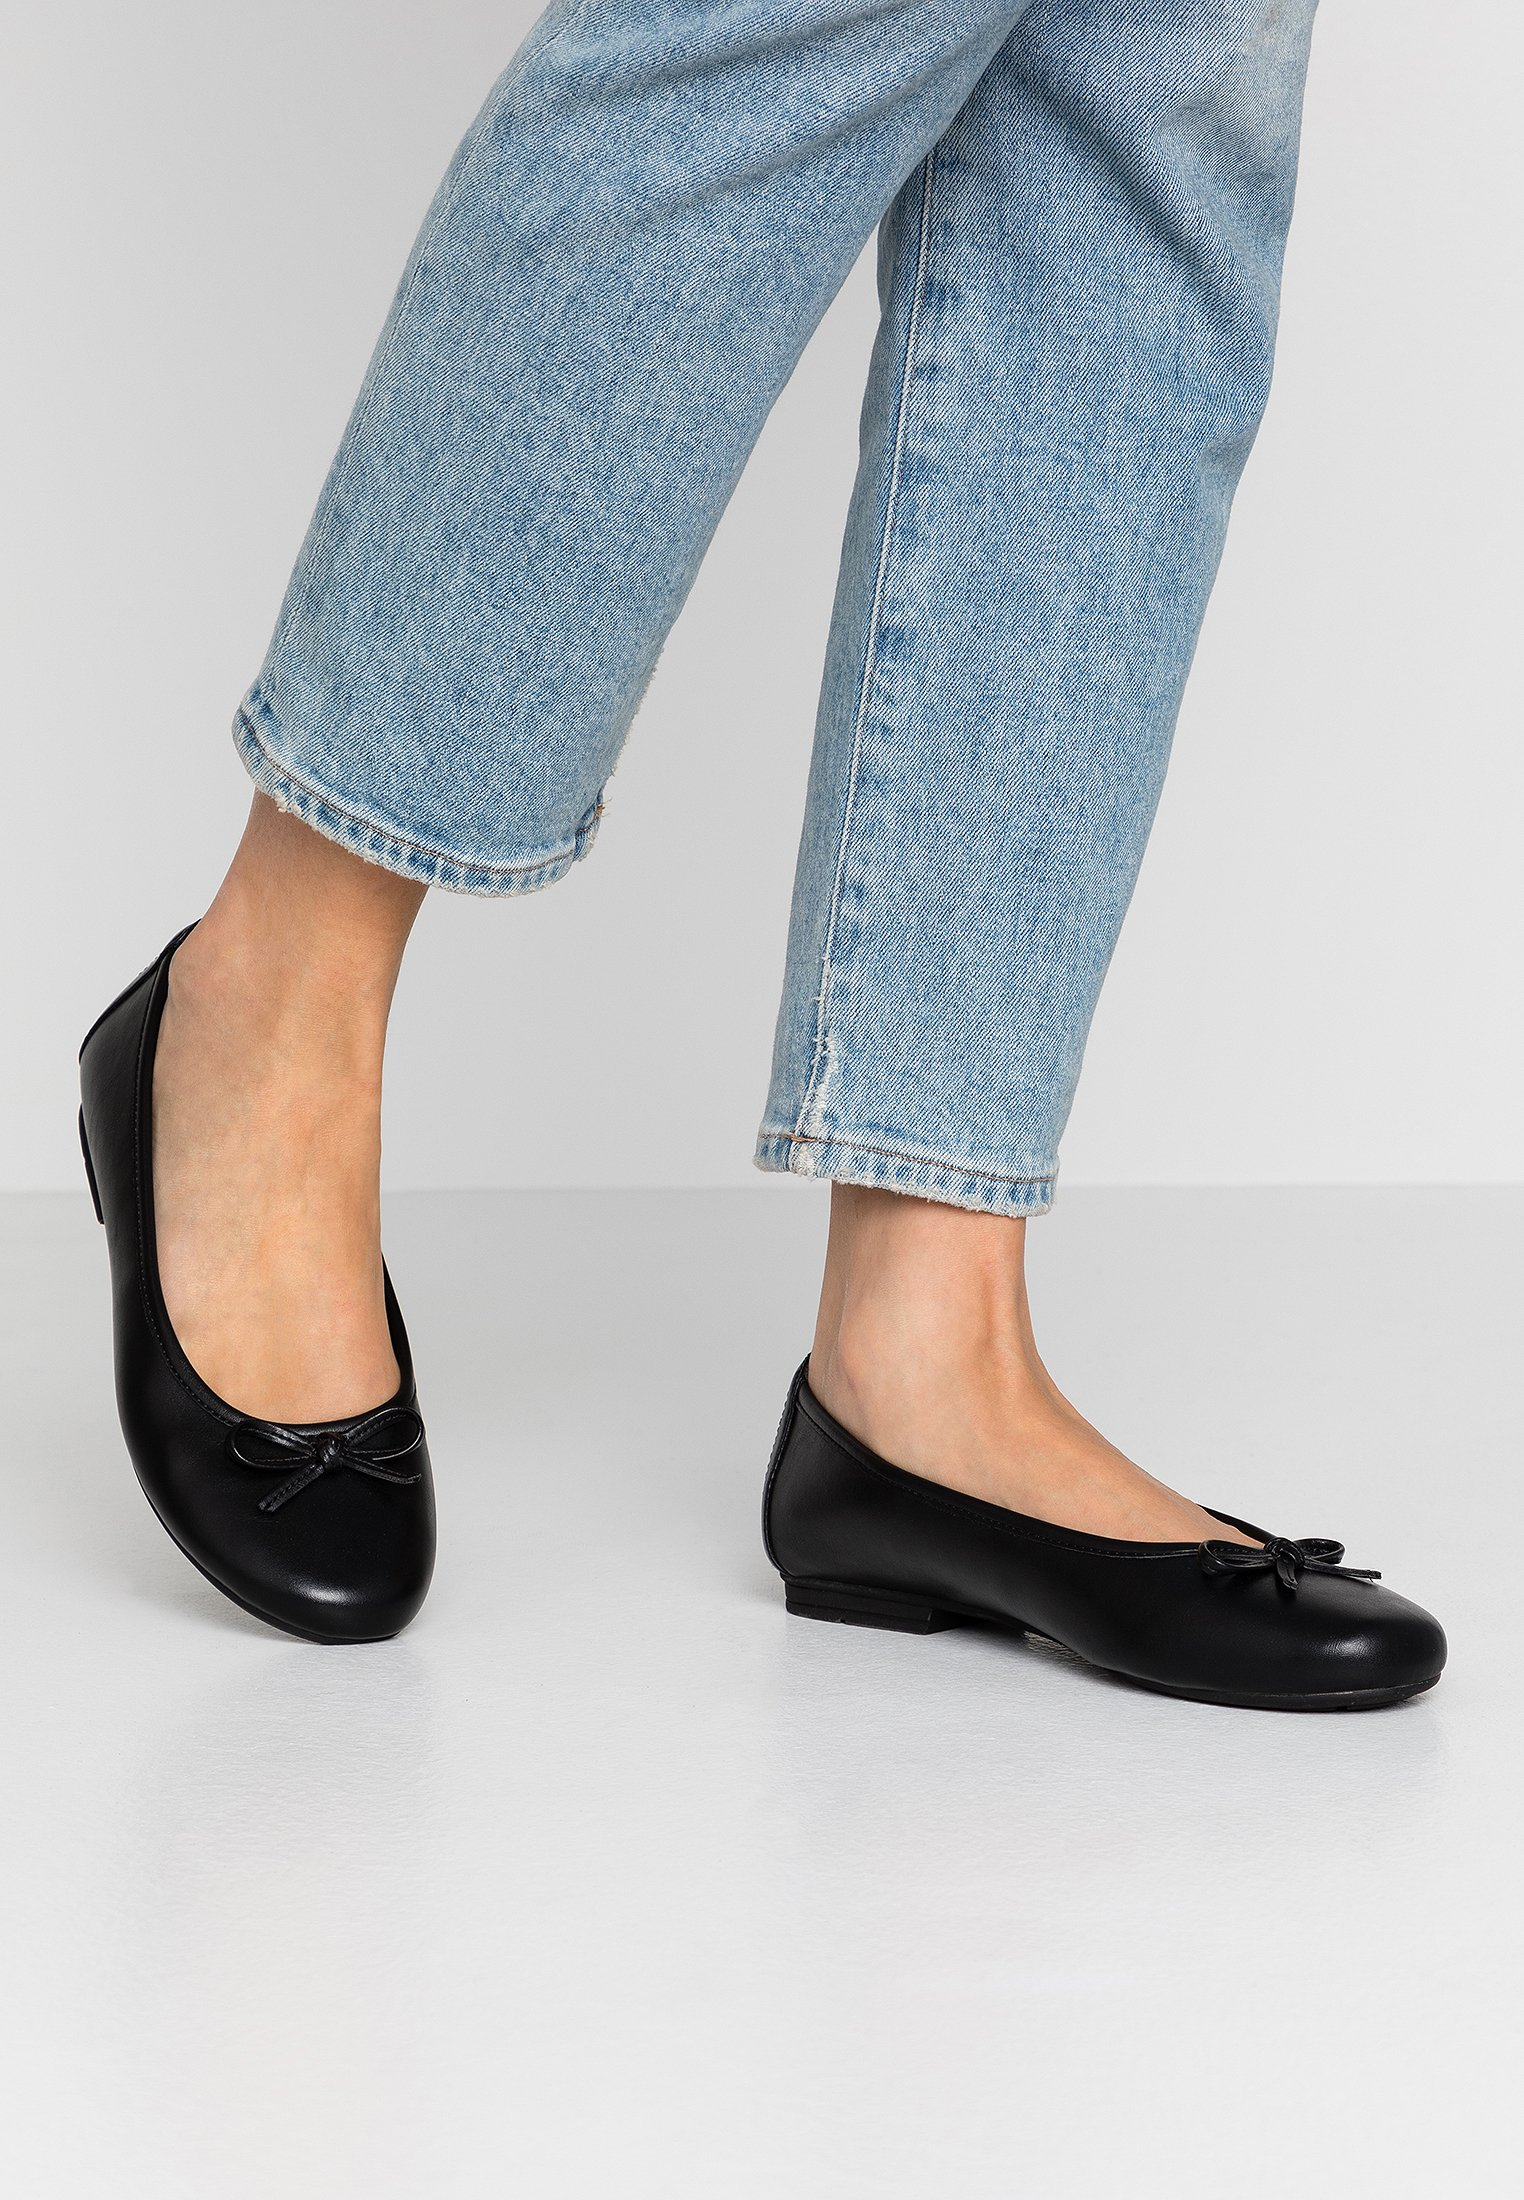 Tosca Blu SHADEE Stivali alti black zalando neri con tacco